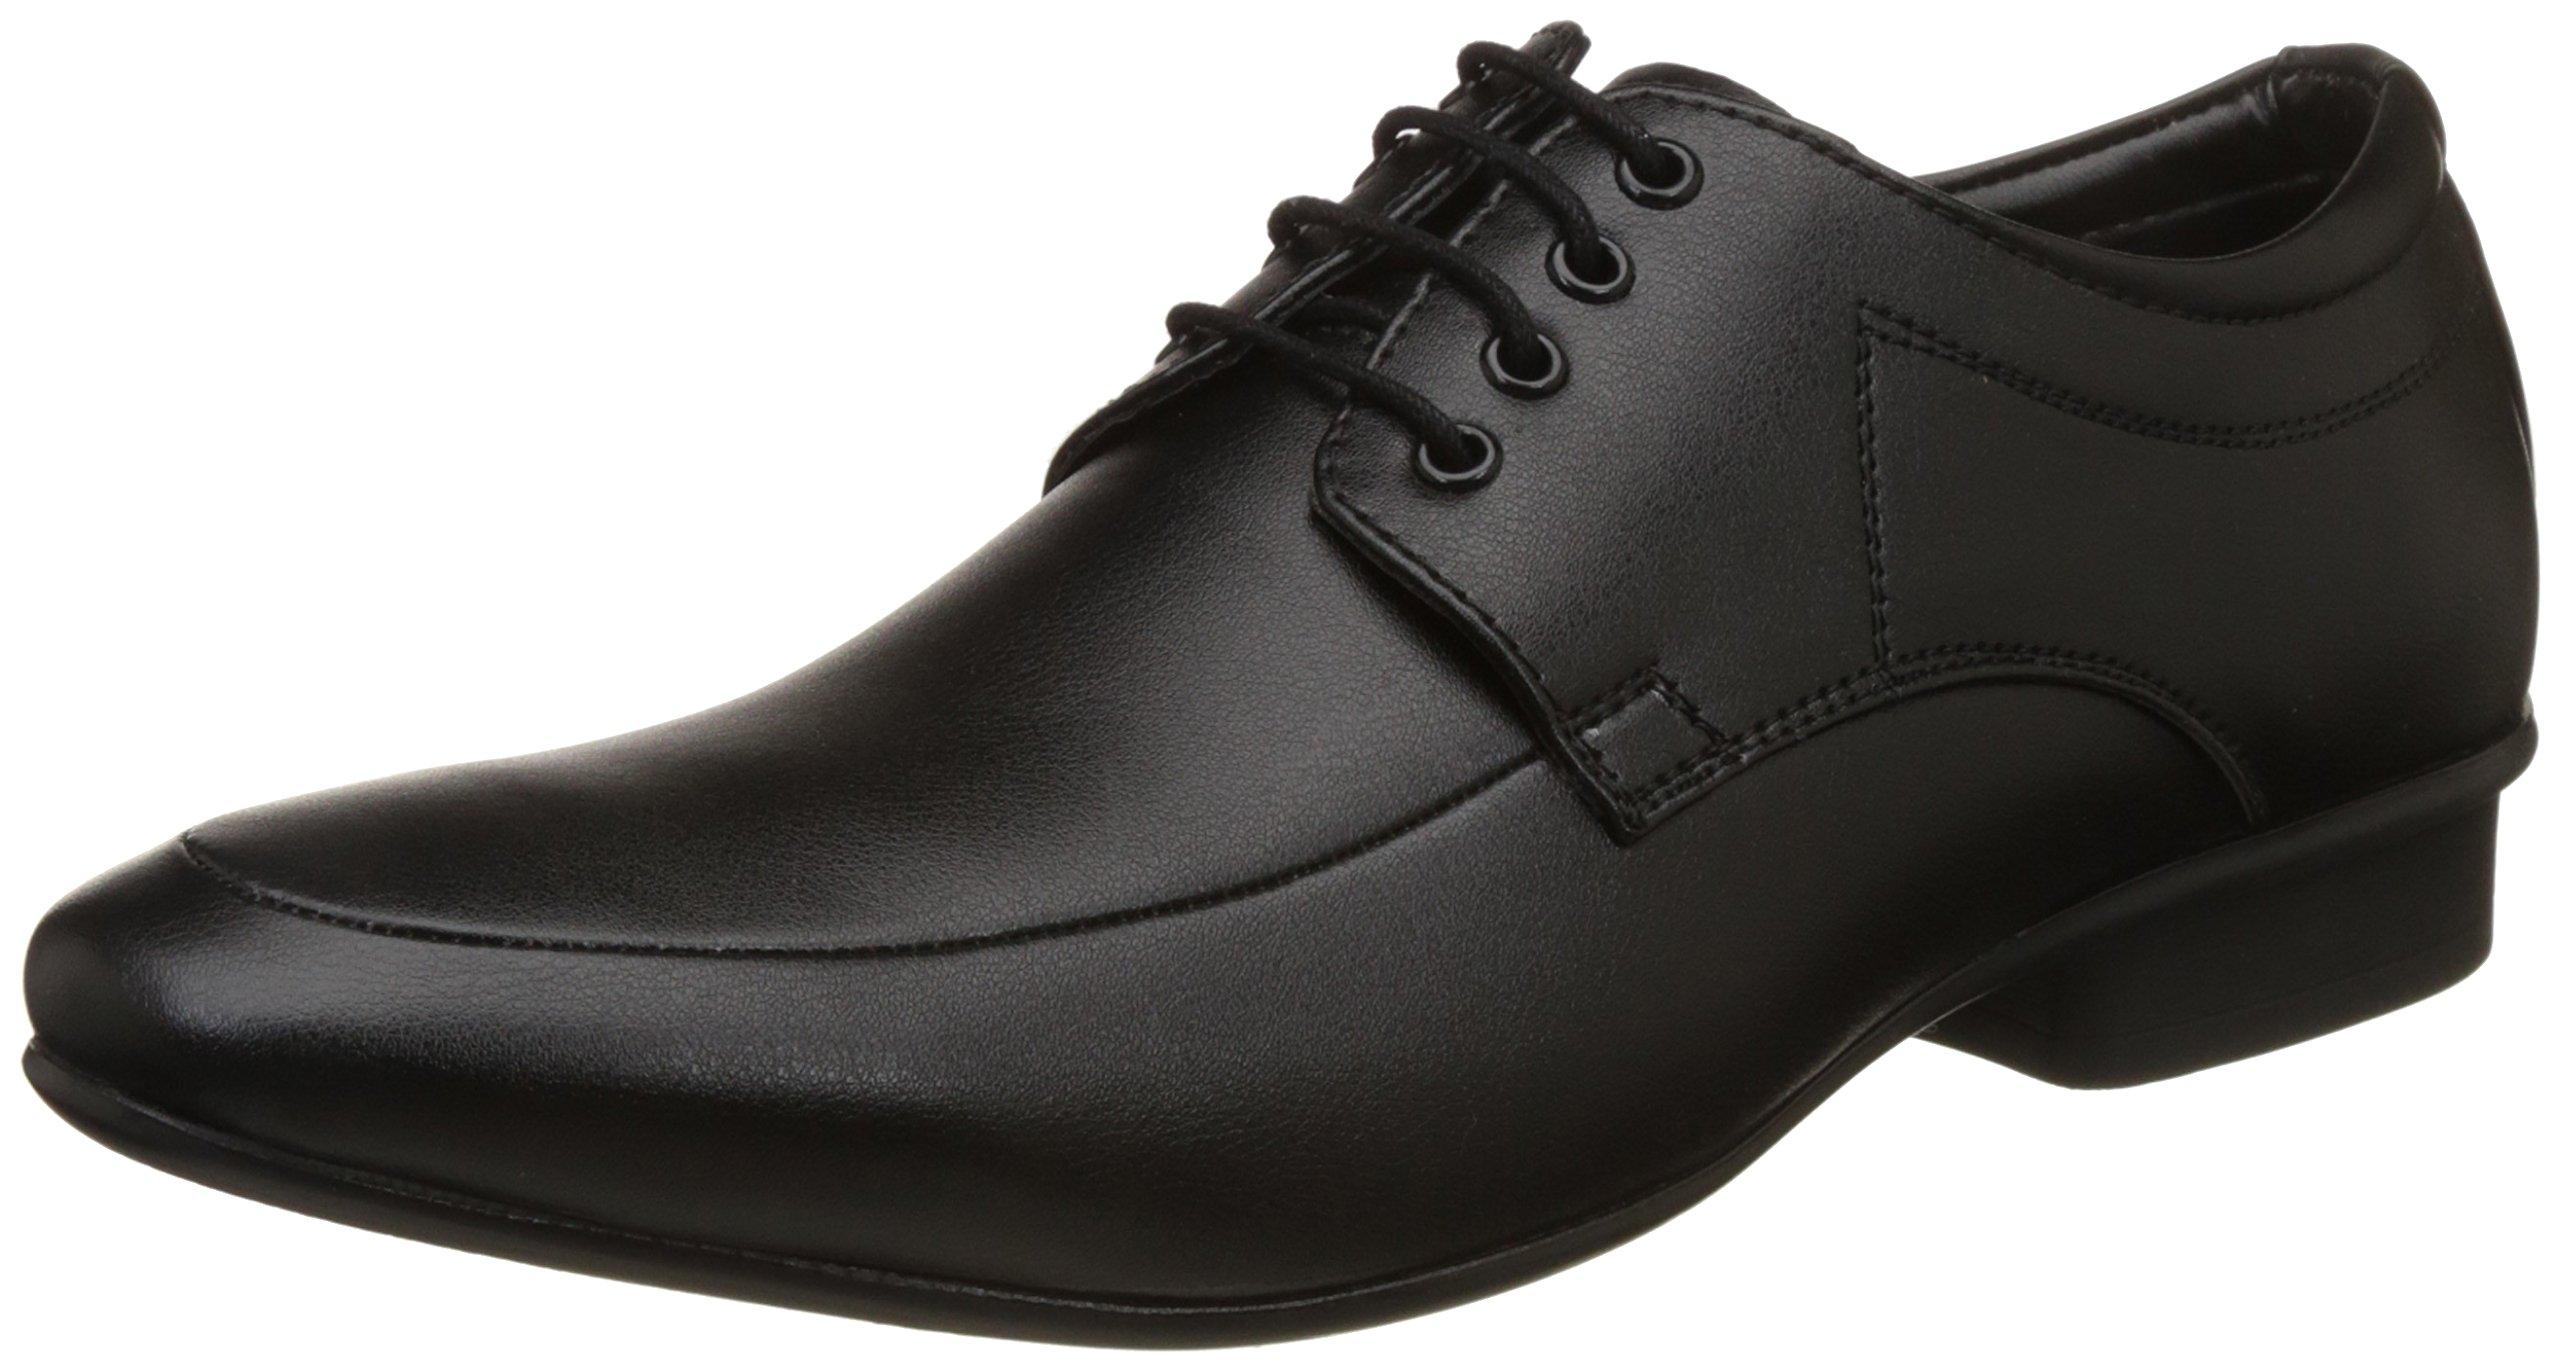 BATA Men's Rayson Black Formal Shoes - 10 UK/India (44 EU)(8216019) (B076KRZ761) Amazon Price History, Amazon Price Tracker